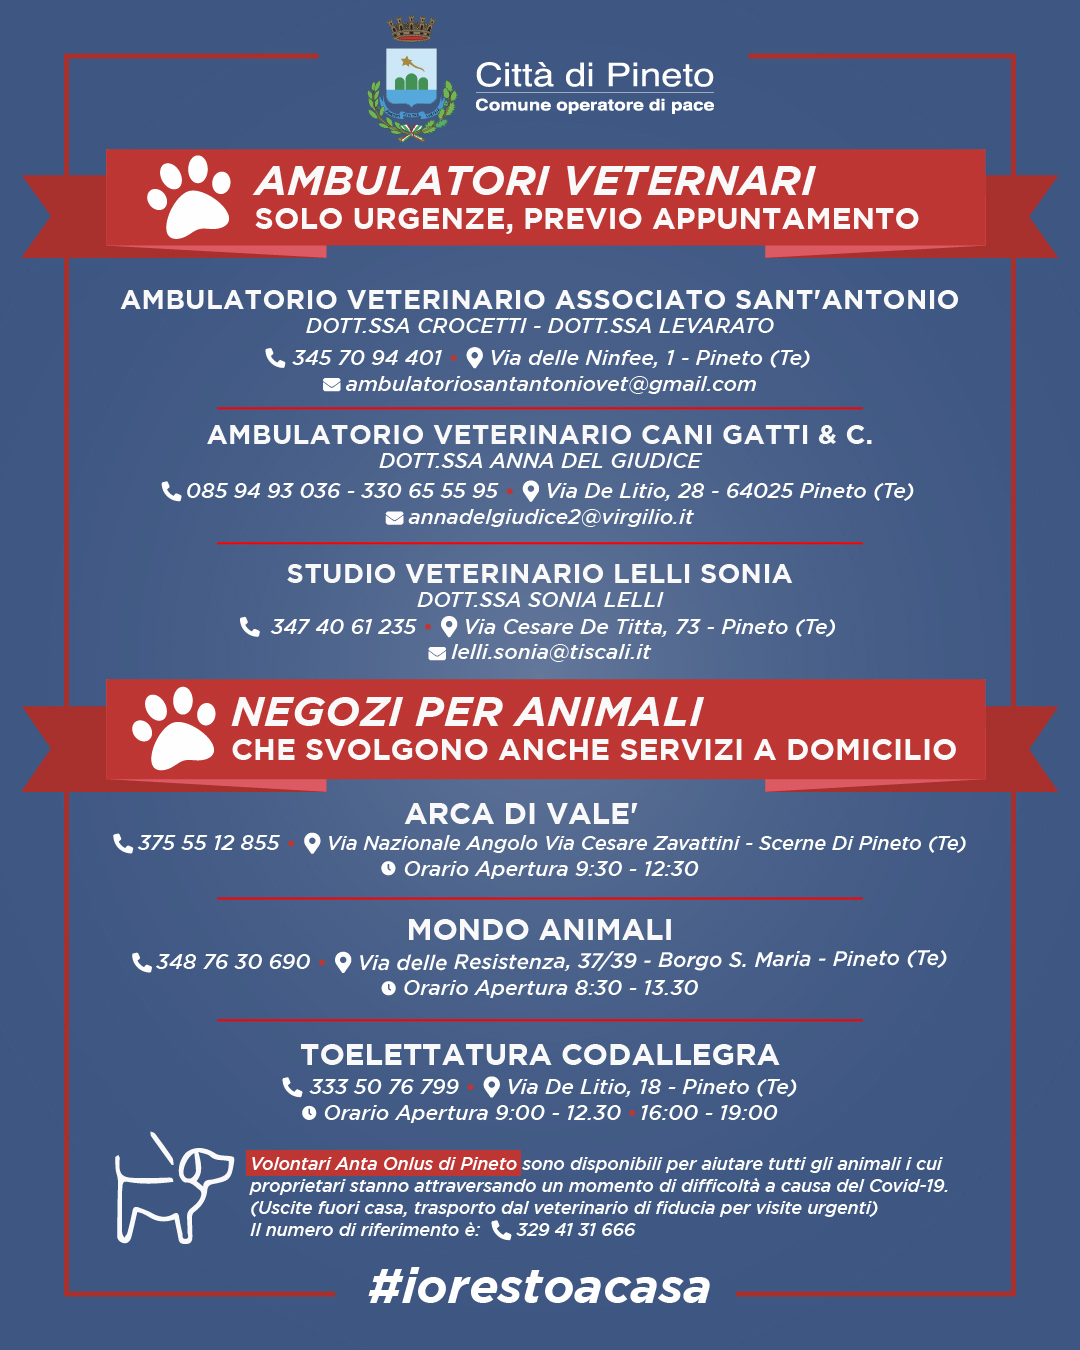 veterinari e negozi